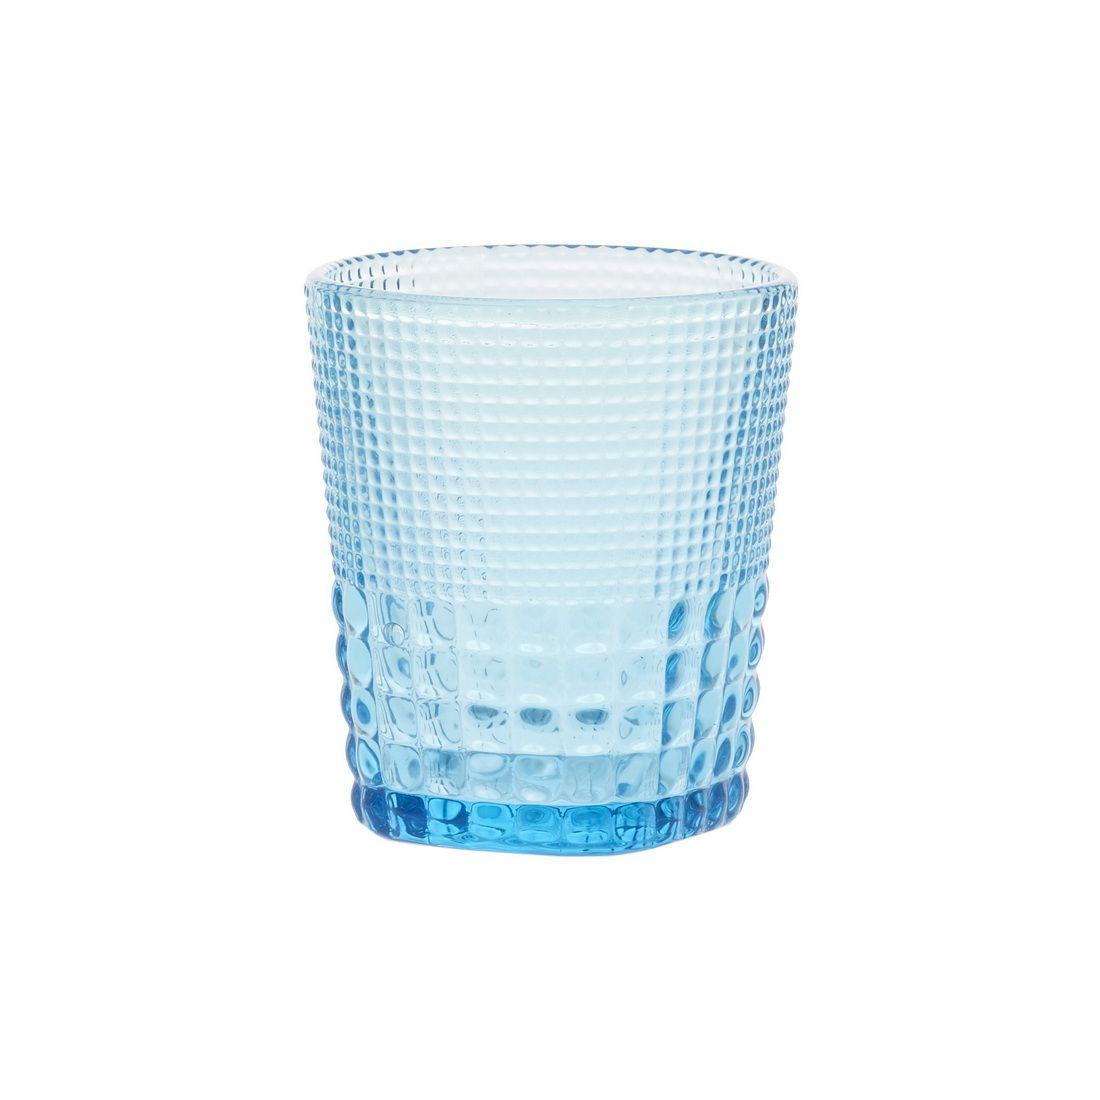 Стакан для напитков Royal drops, голубой<br>